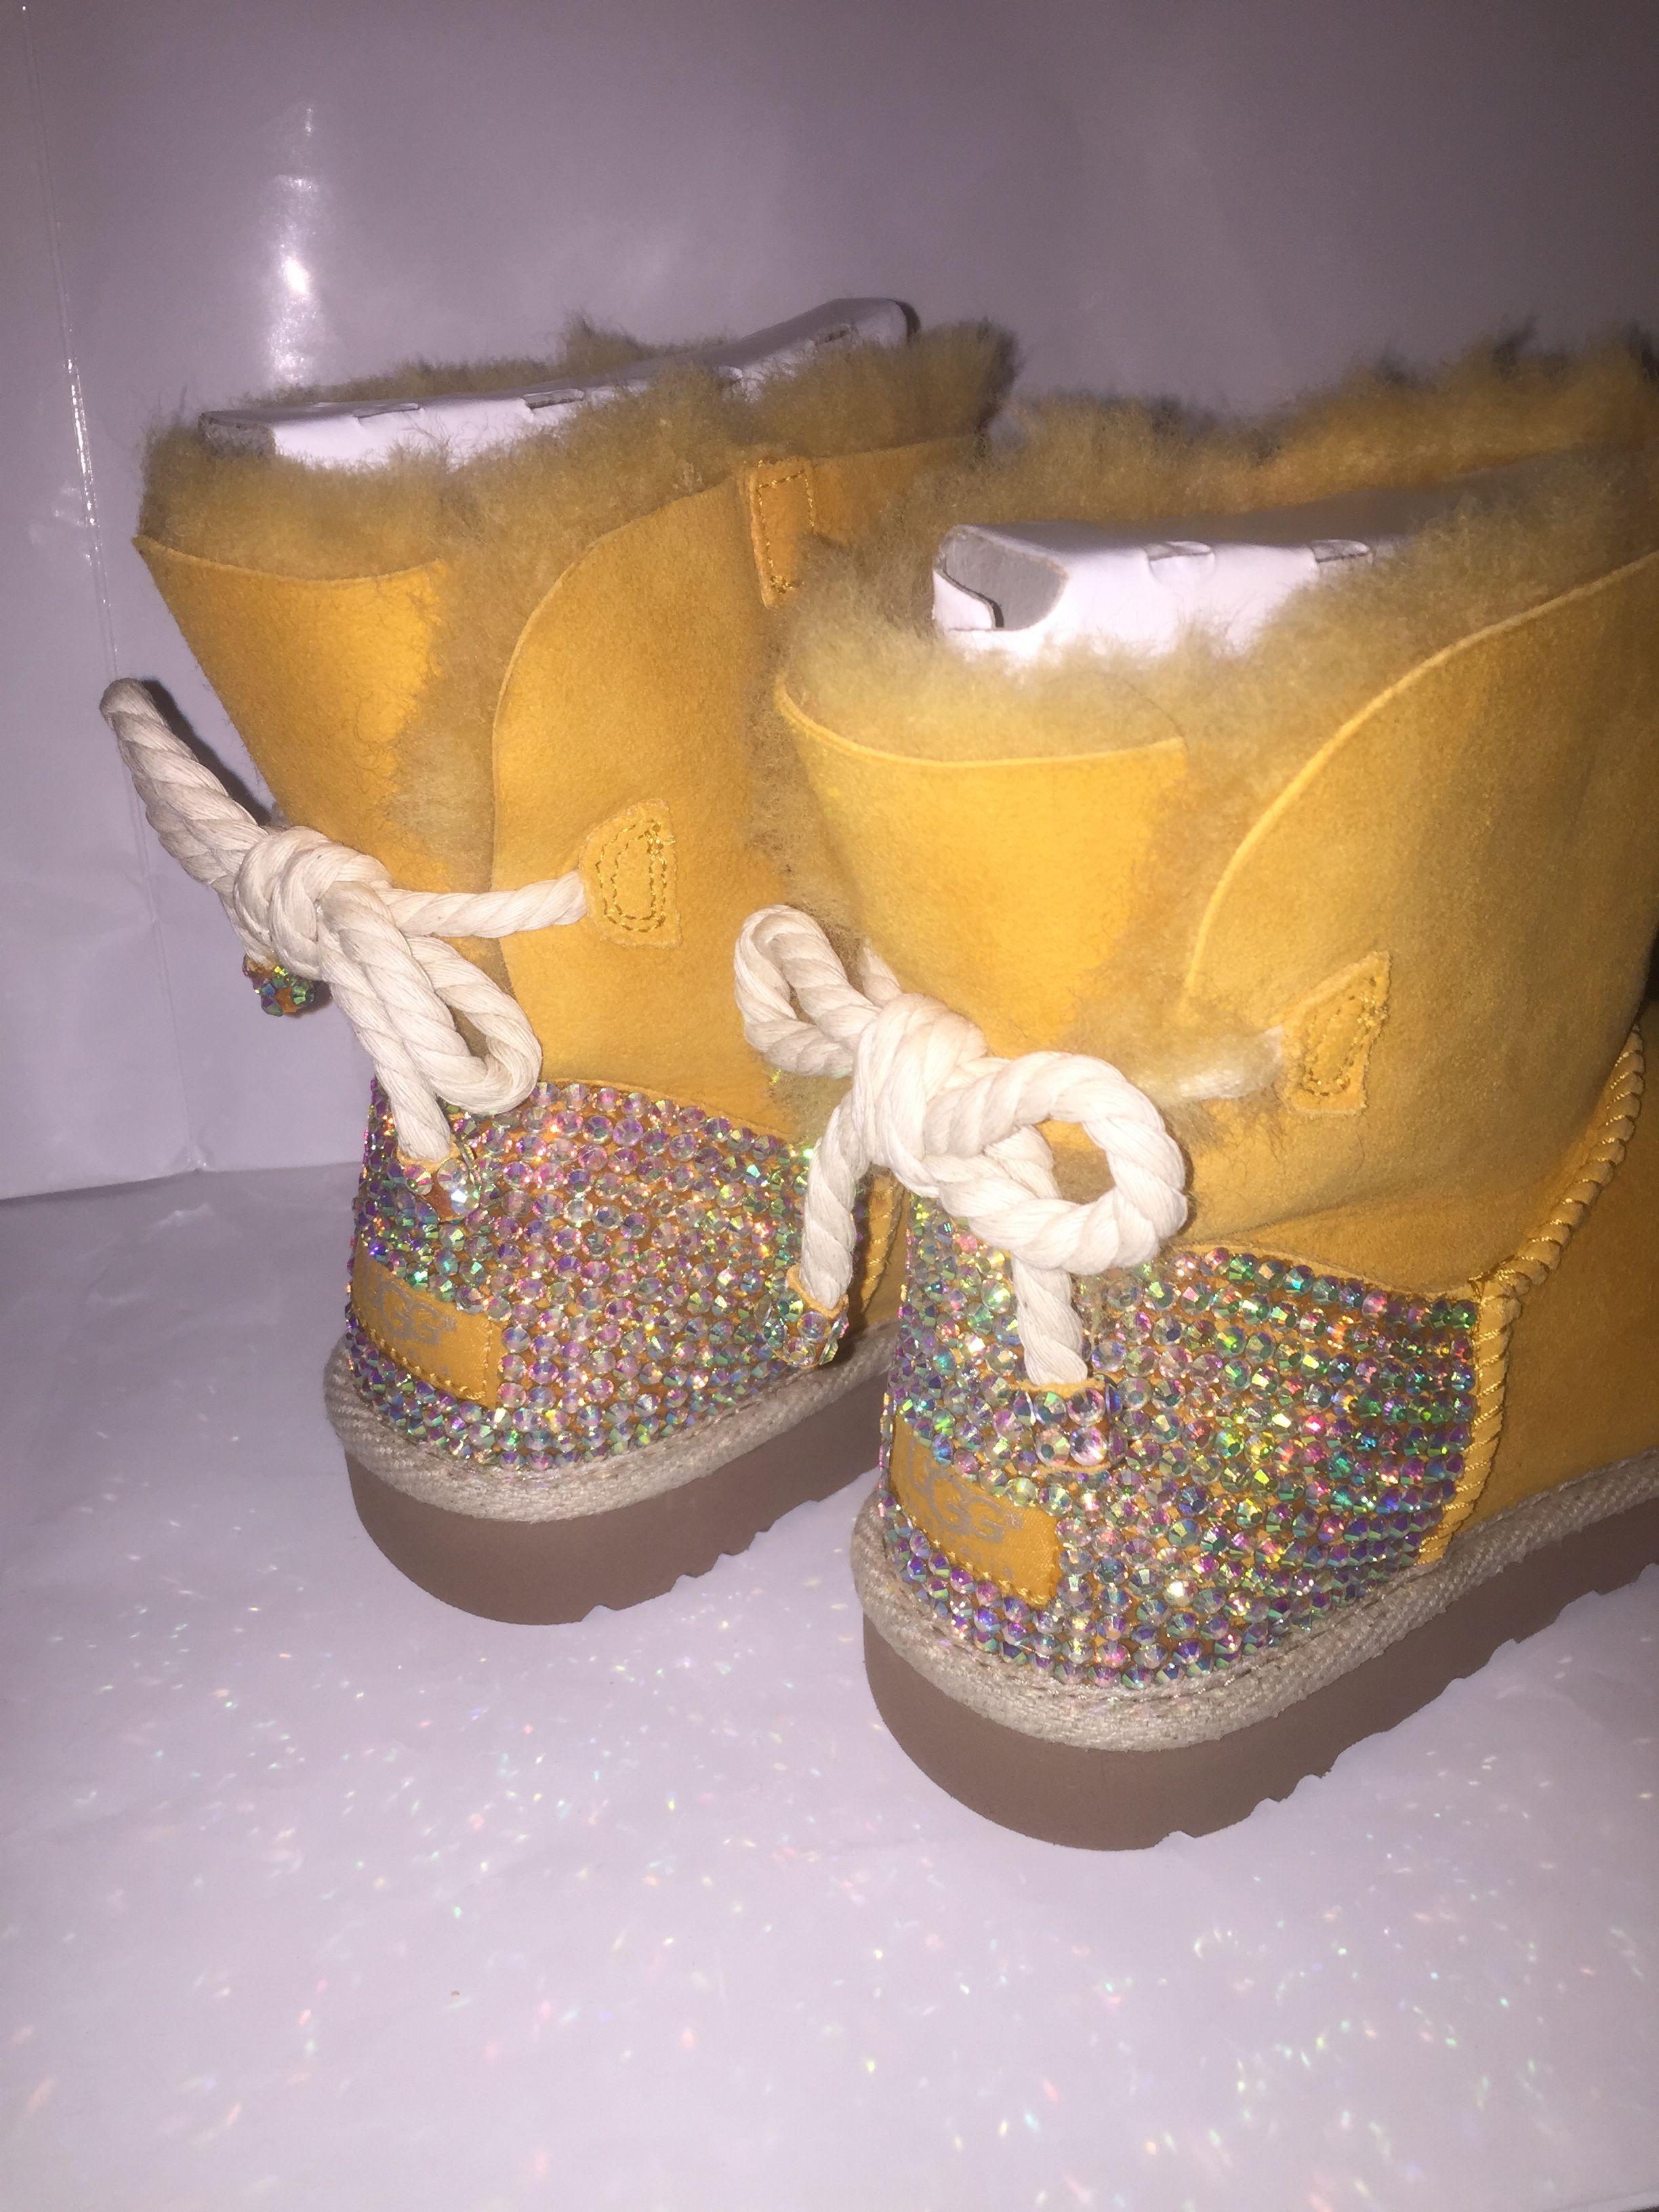 b7c5c32fcf6d Custom Bling Ugg Boots Embellished With High Quality Rhinestones   Pearls